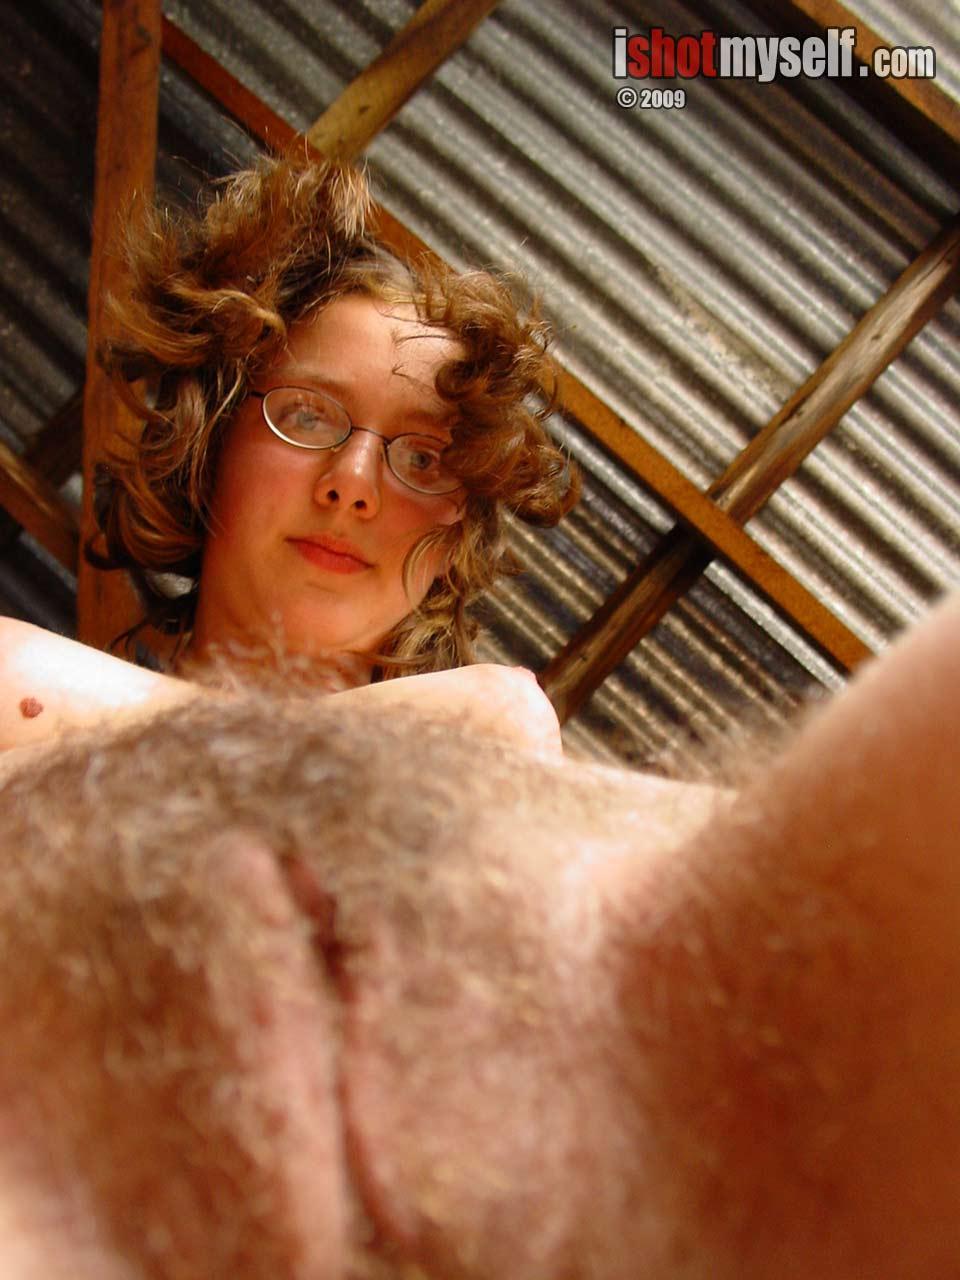 Hairy Selfshot Amateur By I Shot Myself 16 Photos -2742